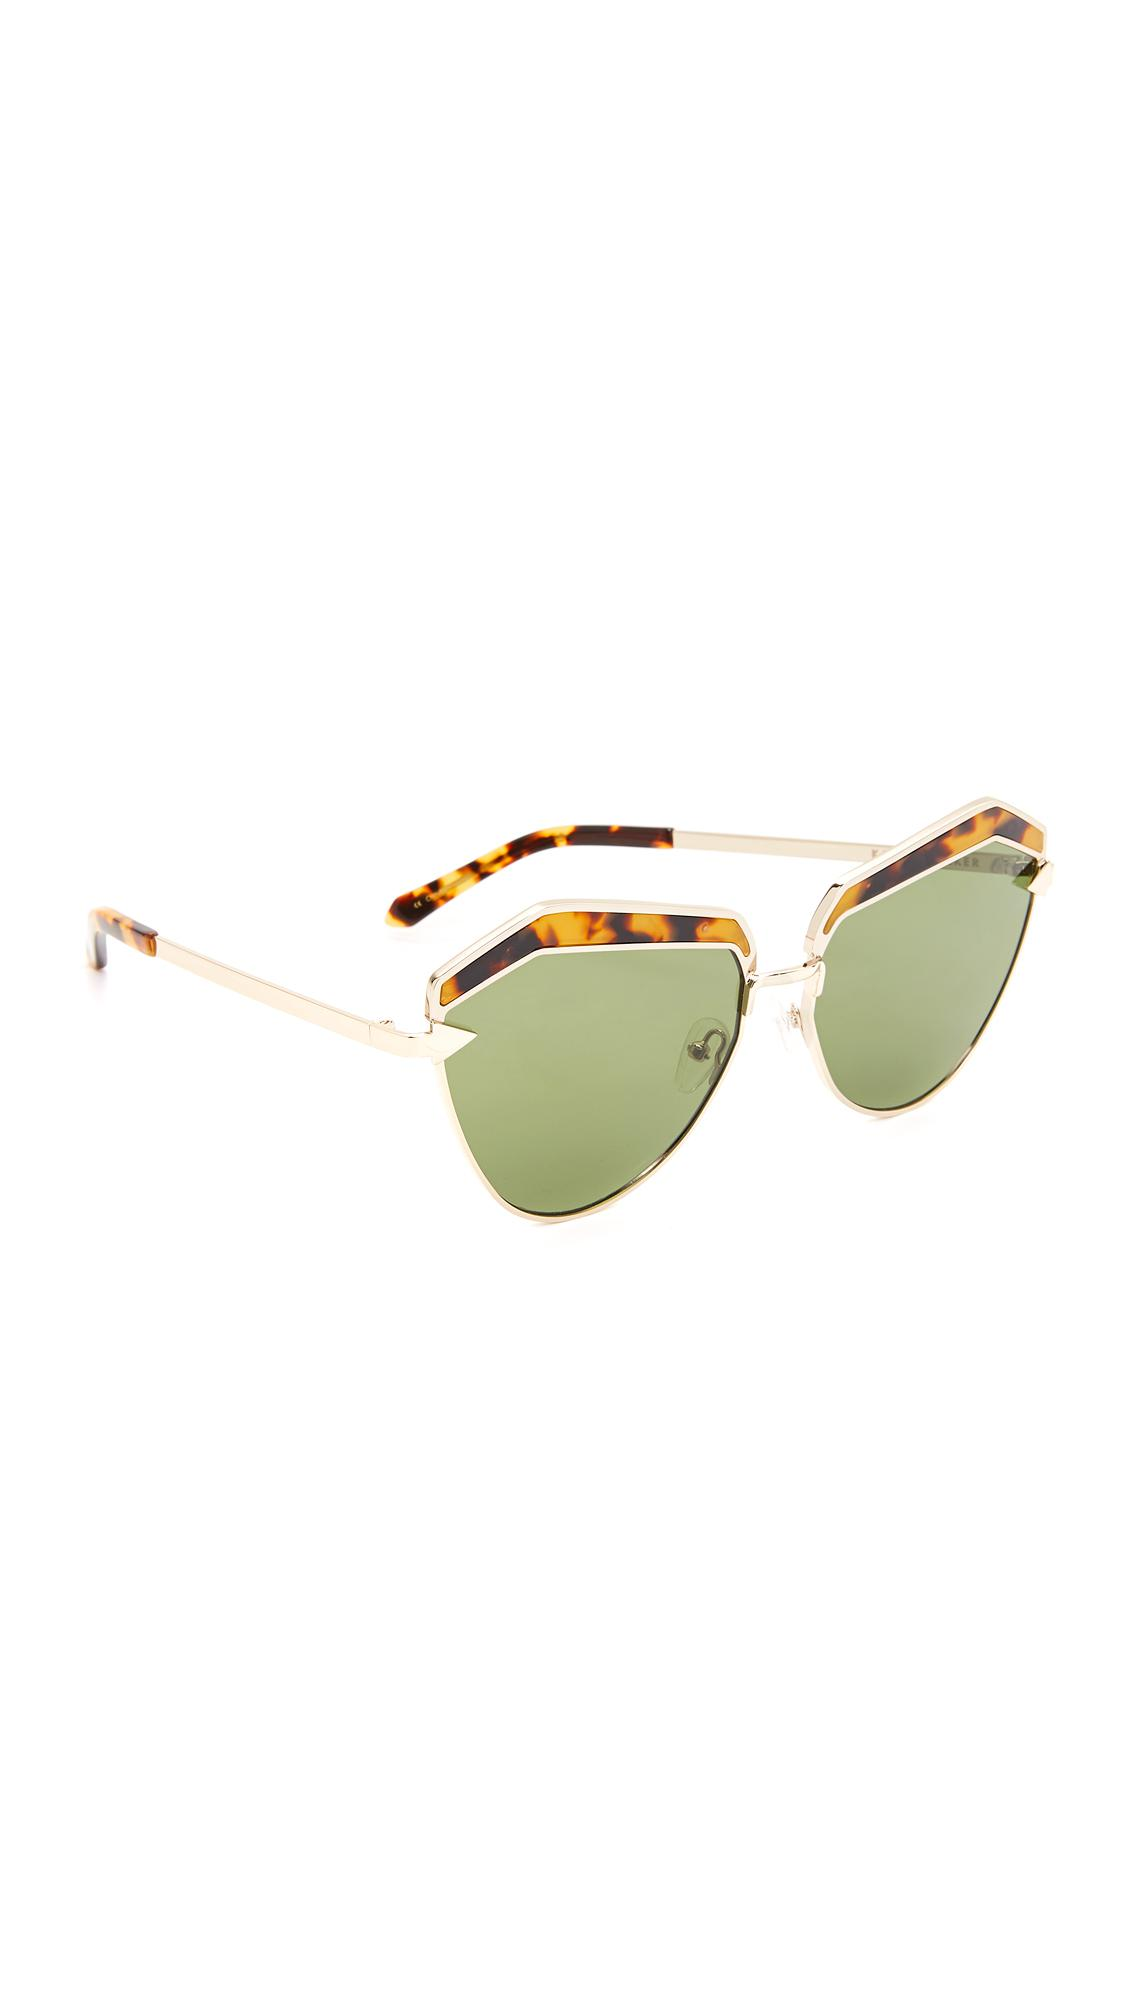 6d33efa2f751 Lyst - Karen Walker Jacinto Sunglasses